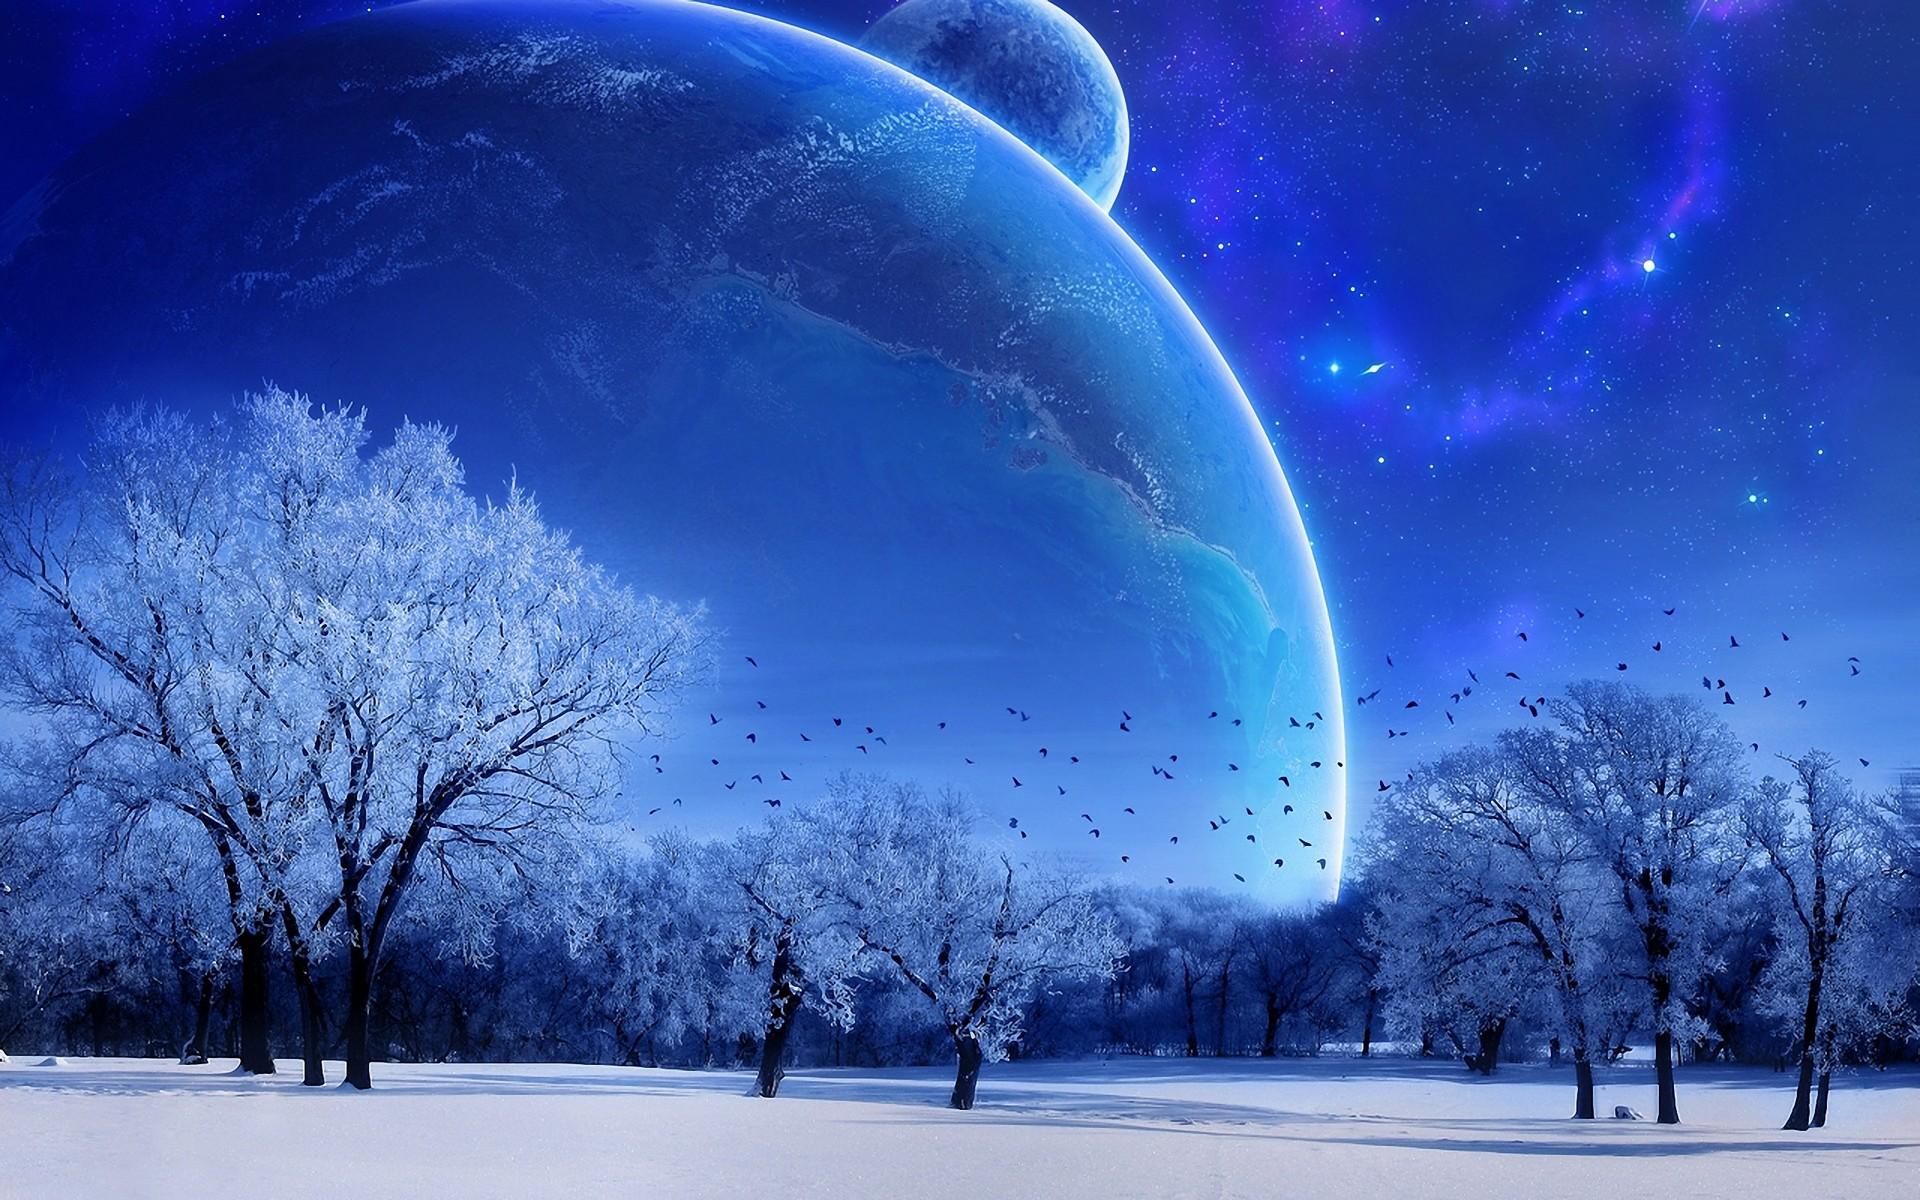 Winter Wallpaper Images of Winter For Your Desktop 1920x1200